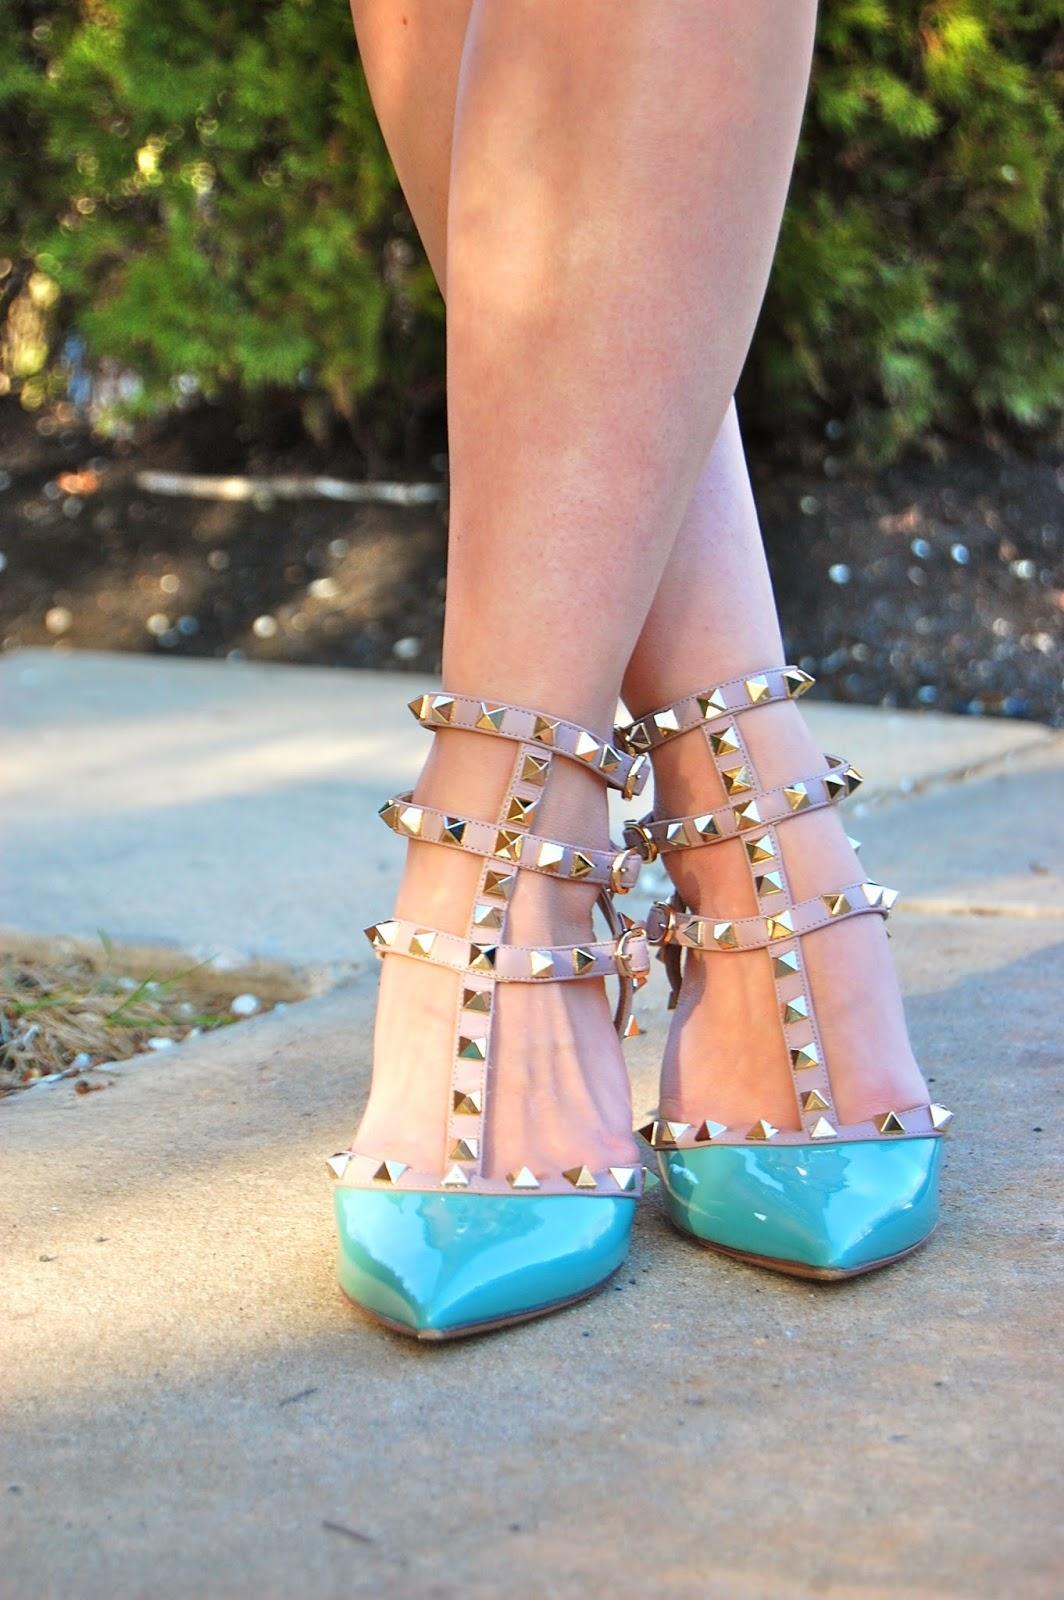 Wearing blue Valentino Rockstud kitten heels